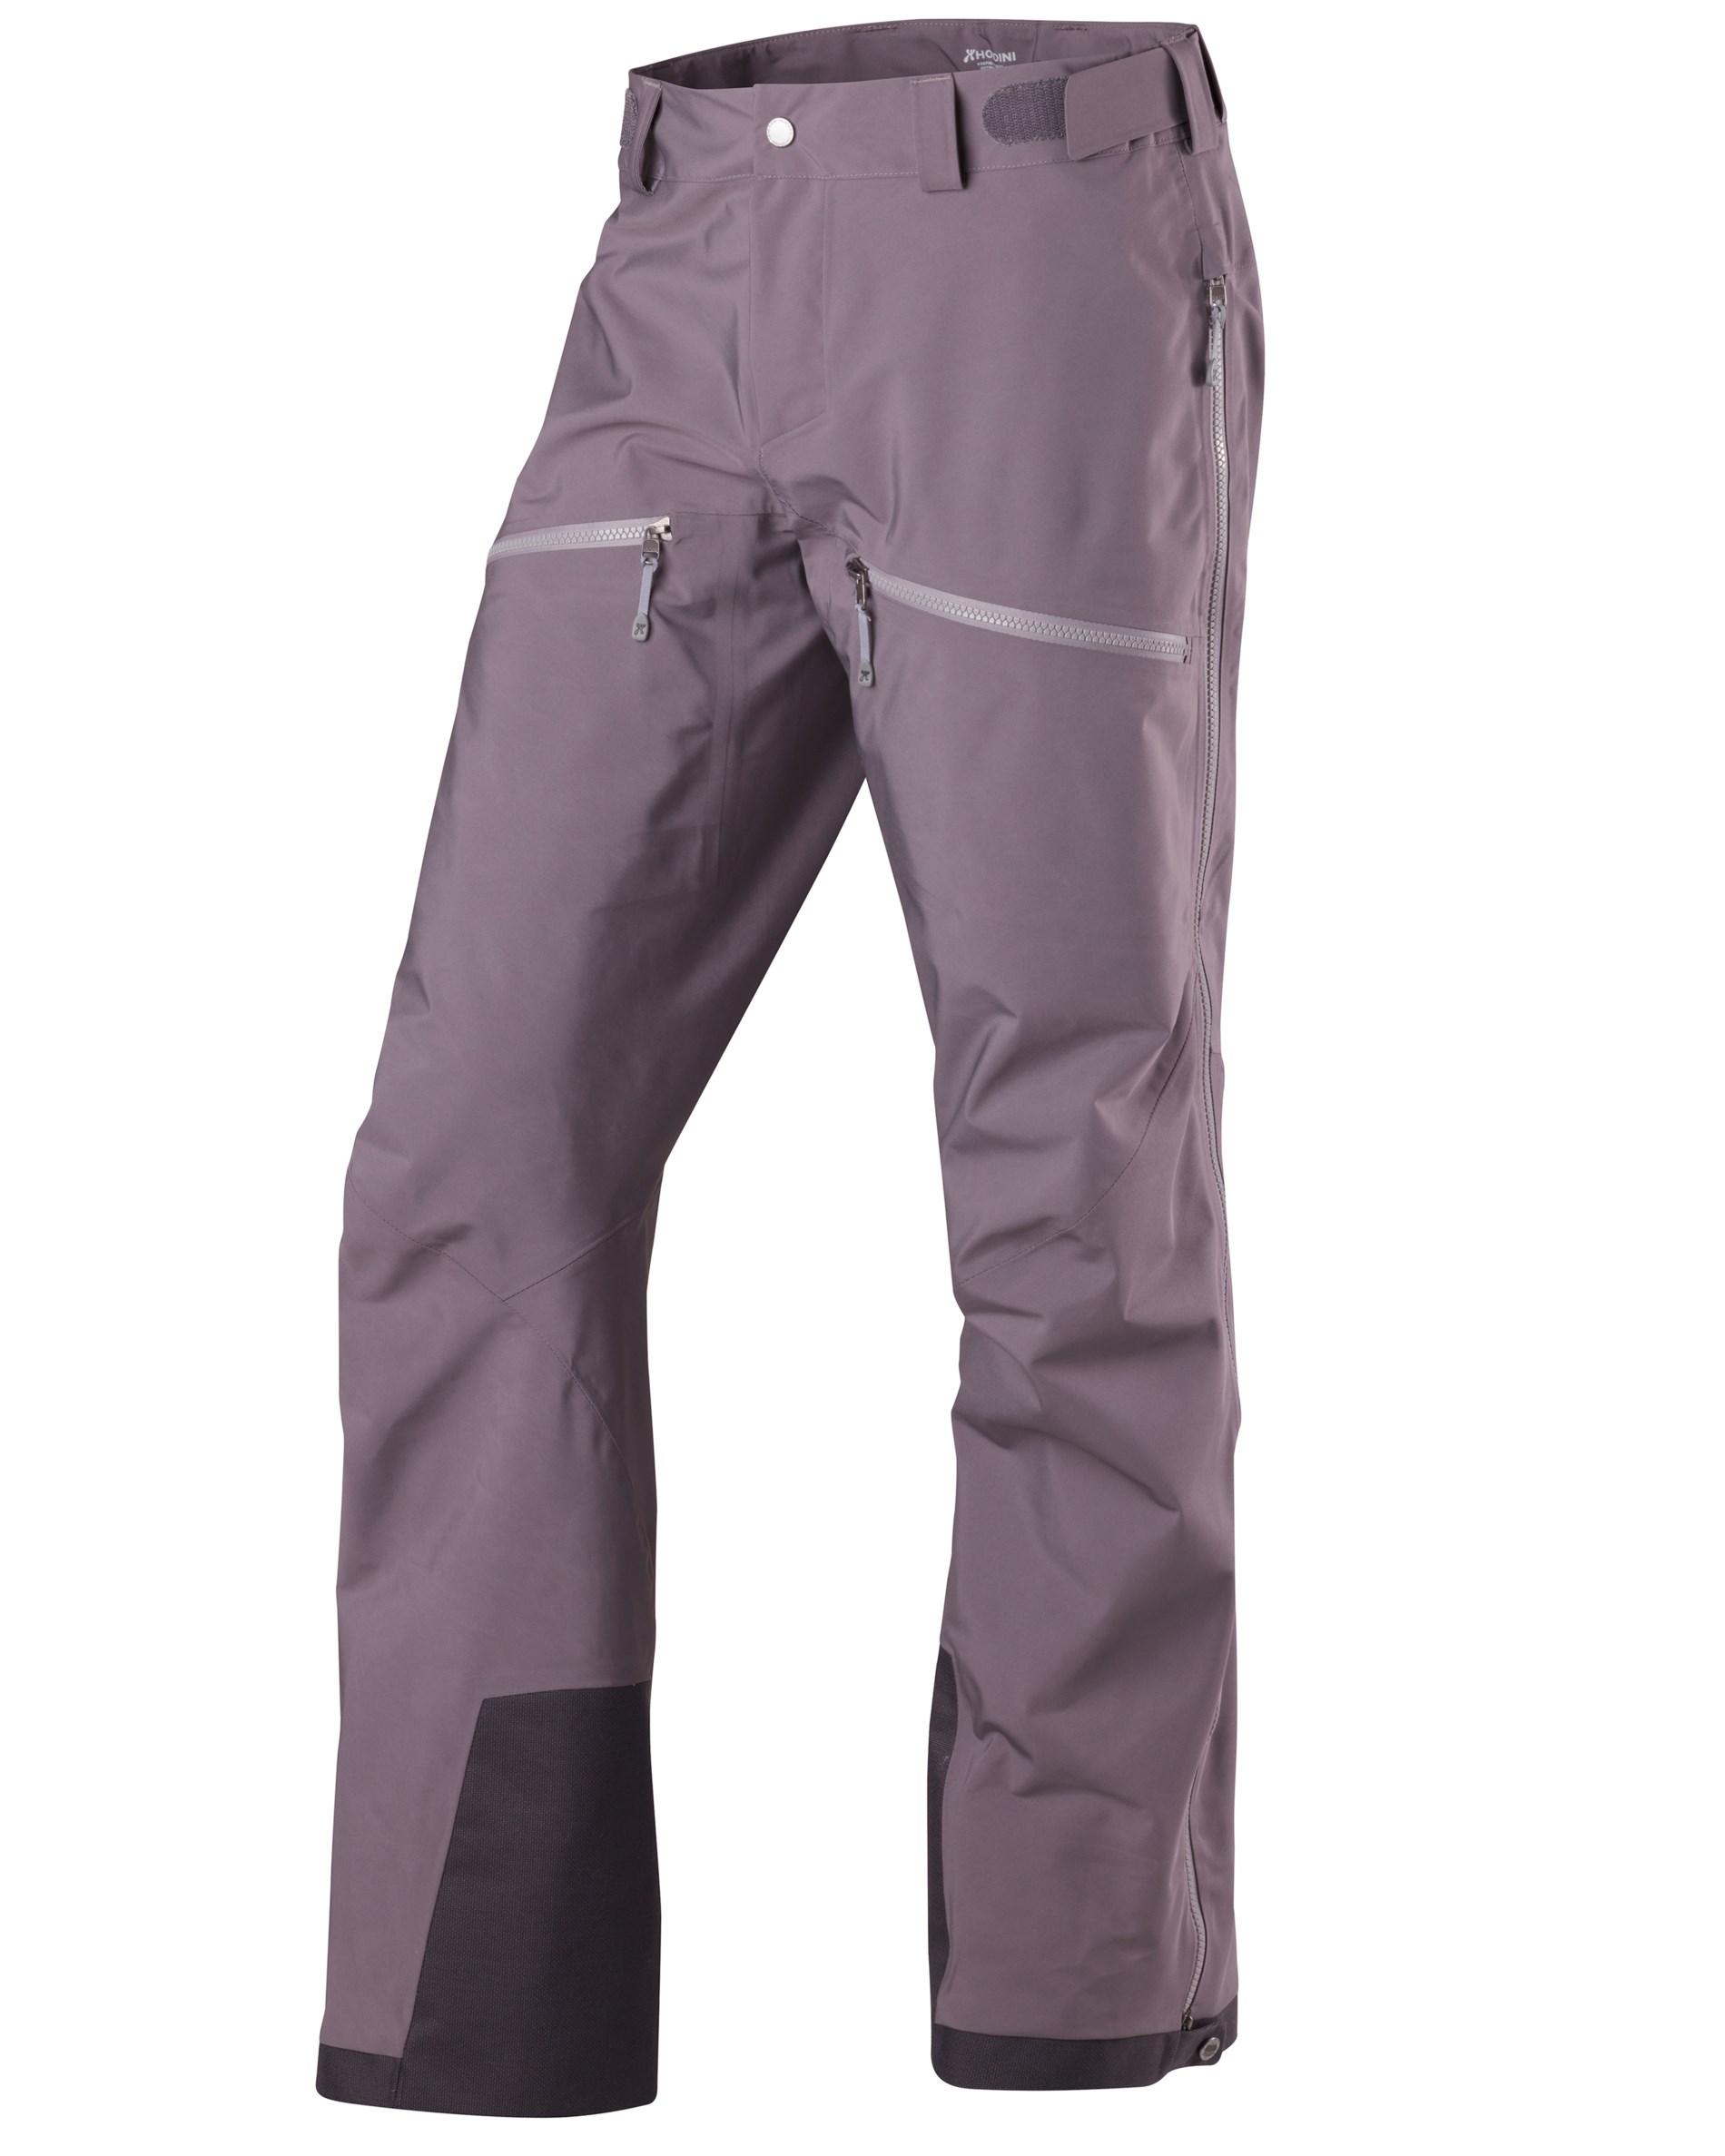 bbb4723d Purpose Pant W wolf grey